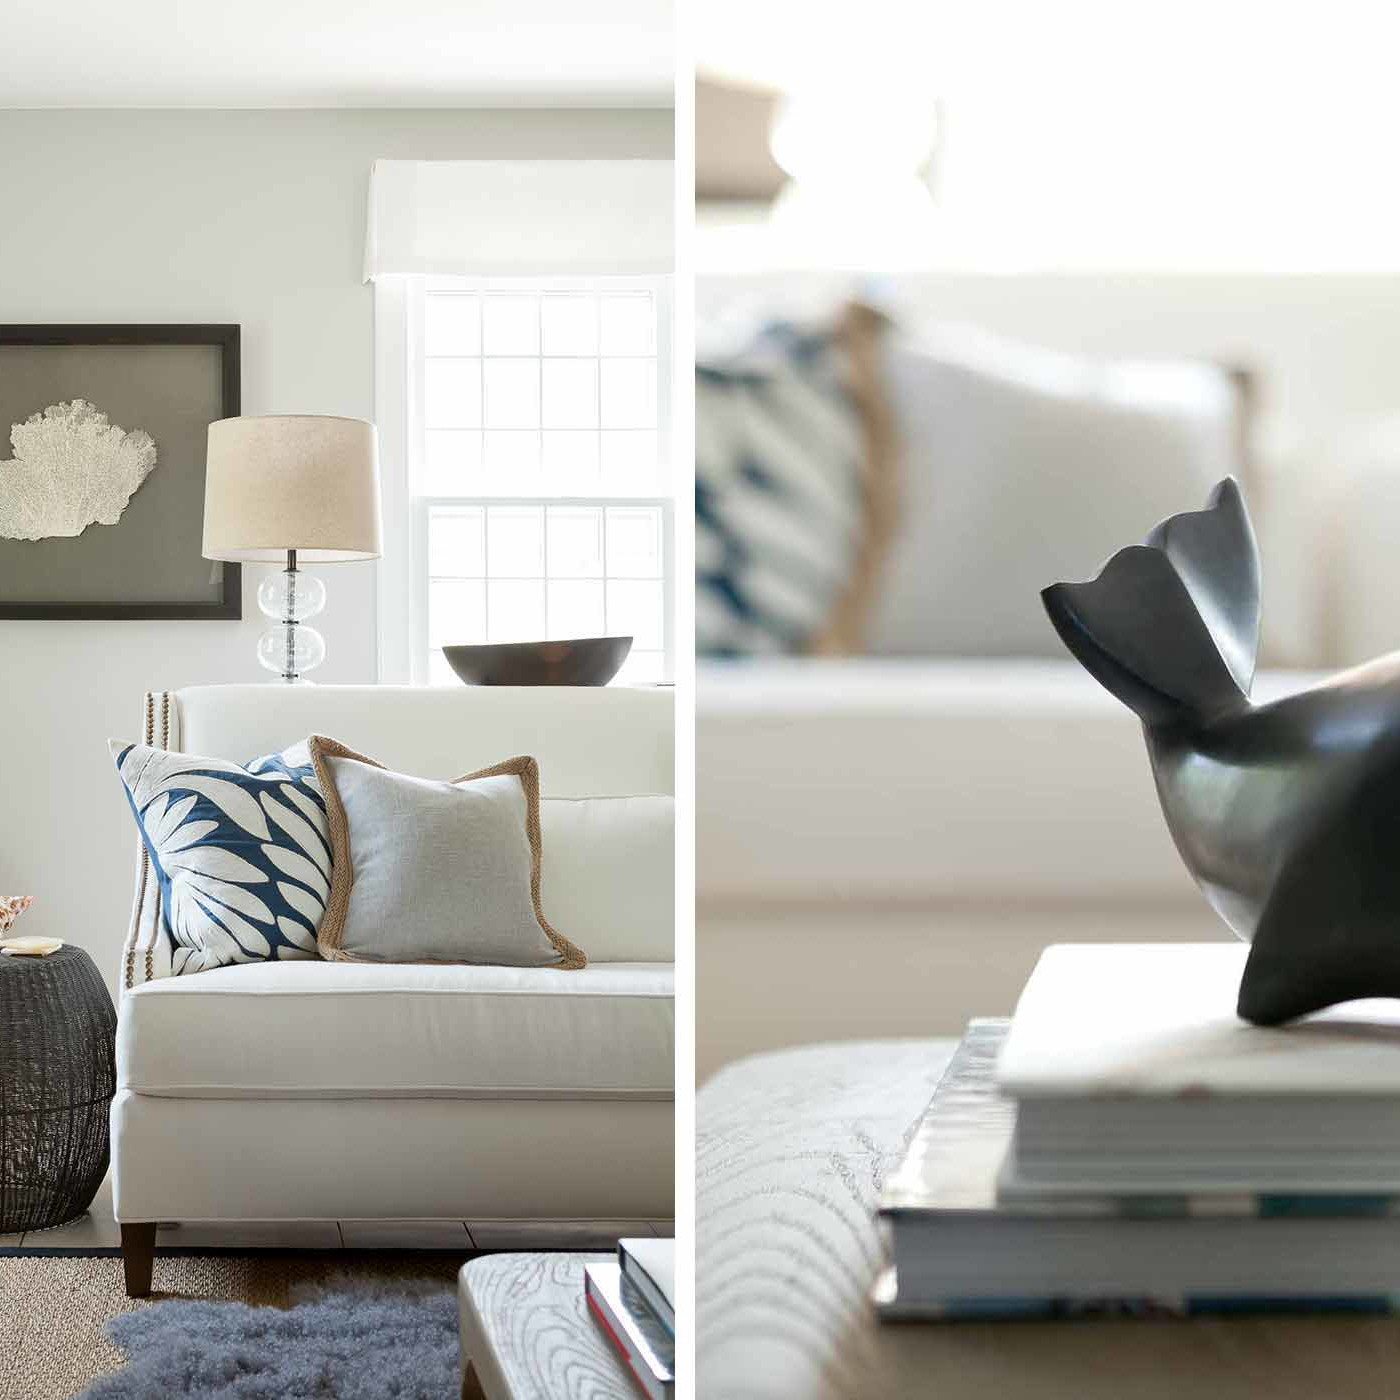 Beach style living room decor details in a Bridgehampton living room by Darci Hether New York